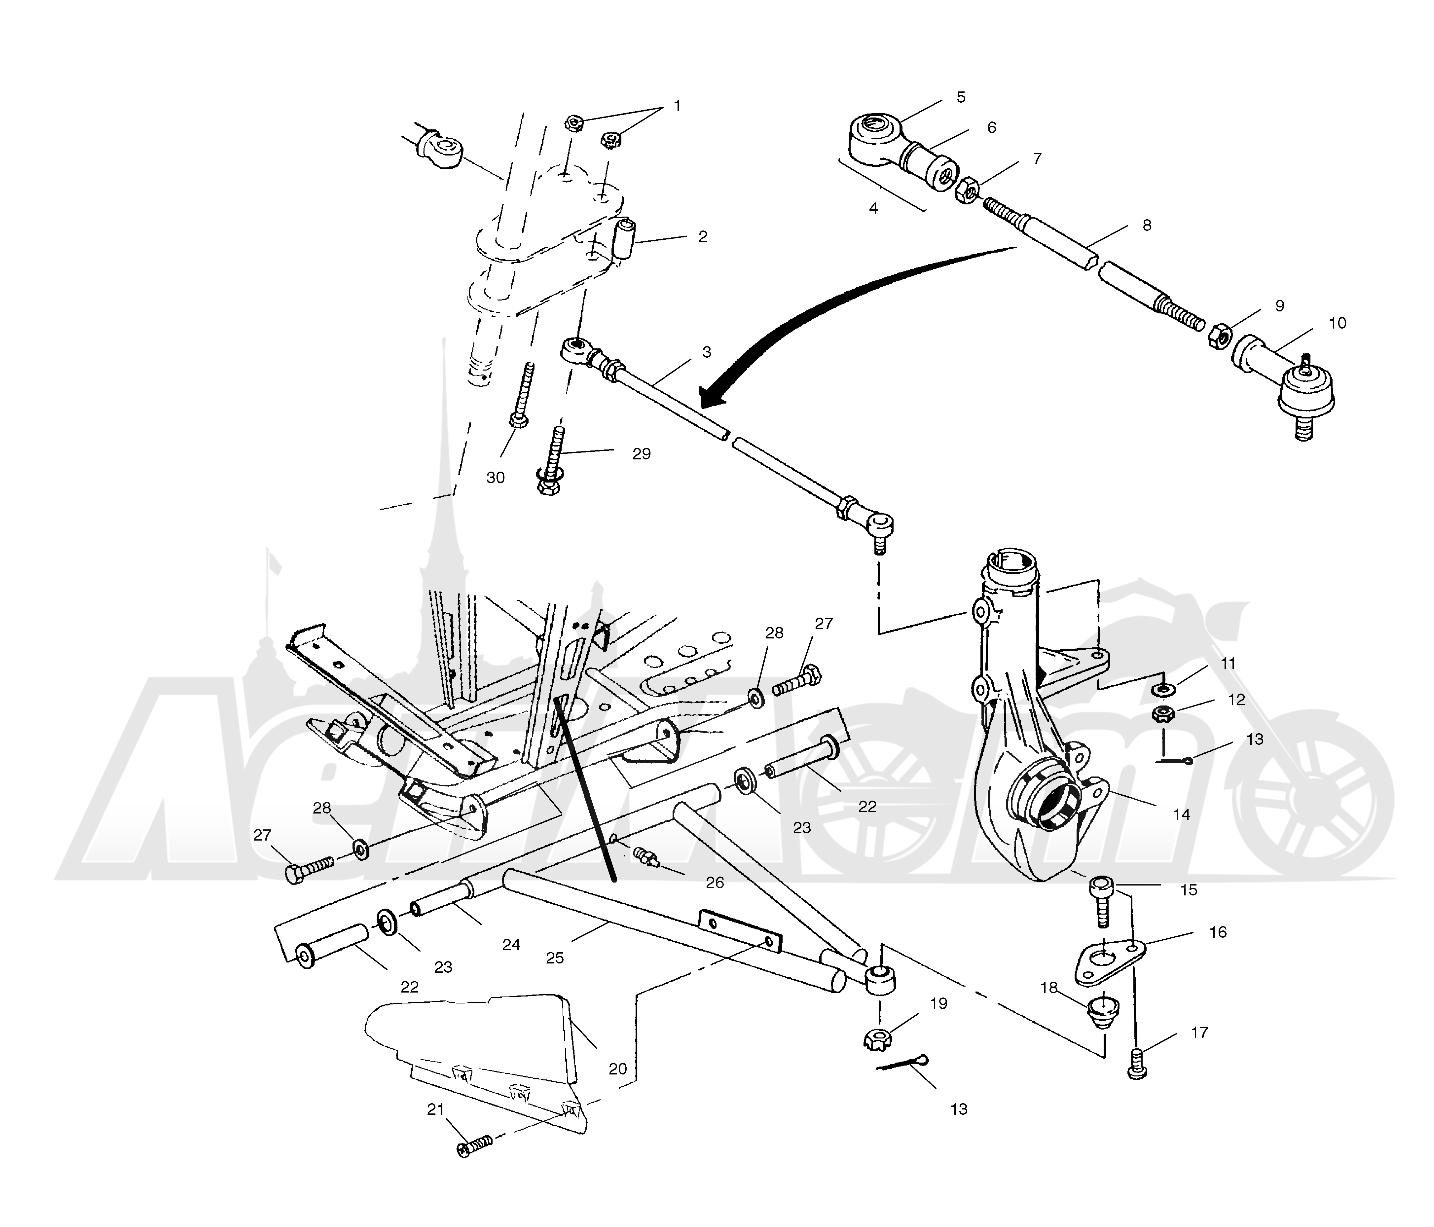 Запчасти для Квадроцикла Polaris 1997 SWEDISH SPORTSMAN 50 - S97CH50E Раздел: A - ARM/STRUT MOUNTING - W97CH50A | A рычаг/стойка крепления W97CH50A